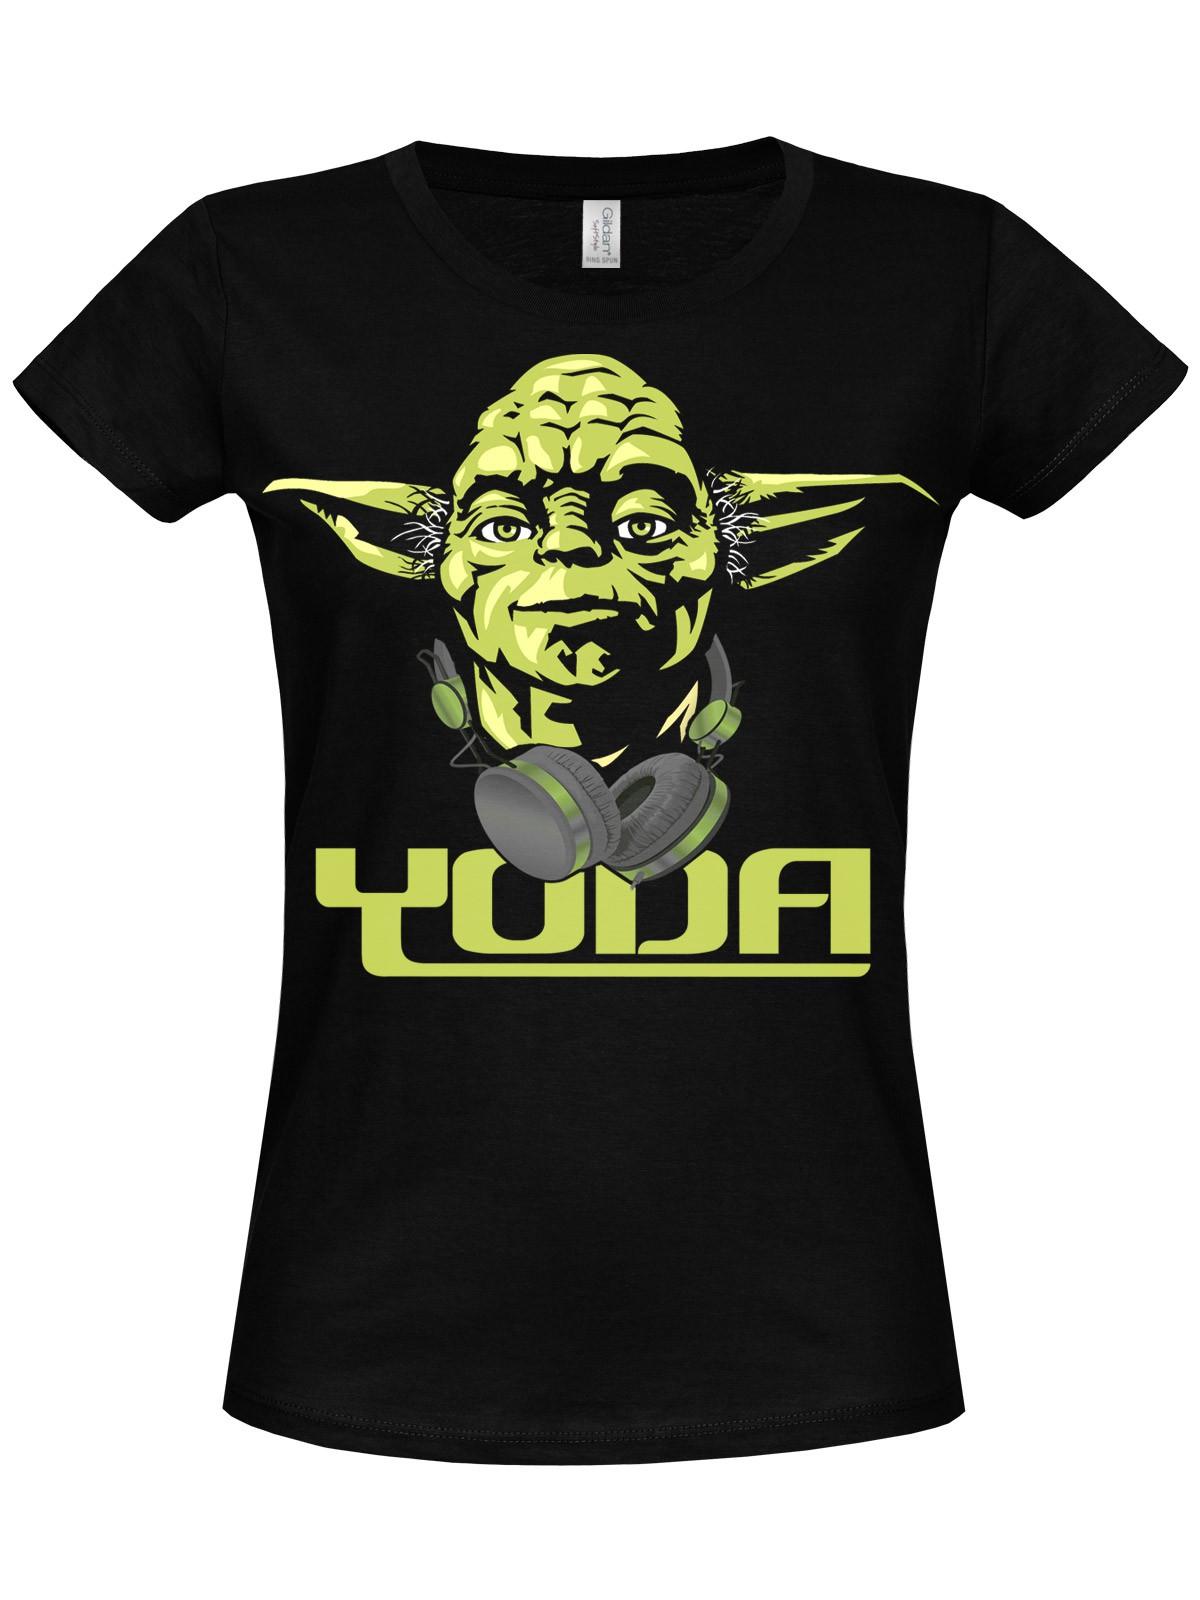 star wars cool yoda girly t shirt black damen t shirts. Black Bedroom Furniture Sets. Home Design Ideas